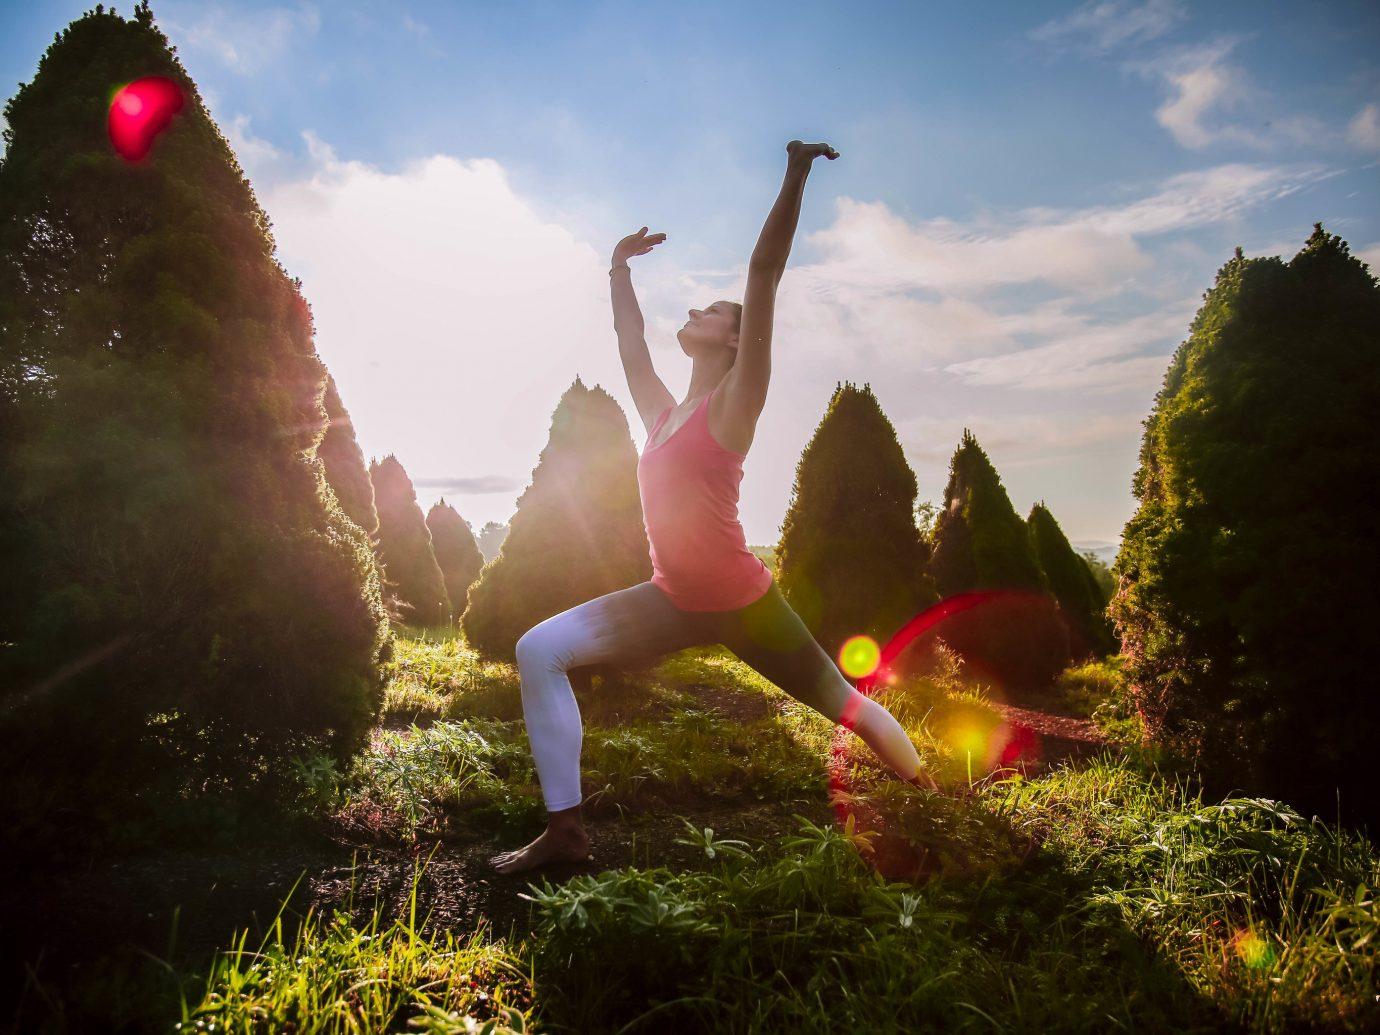 Health + Wellness Meditation Retreats Offbeat Spa Retreats Yoga Retreats outdoor tree sky color Nature light sunlight flower grass morning season leaf Sunset autumn Sun swimming